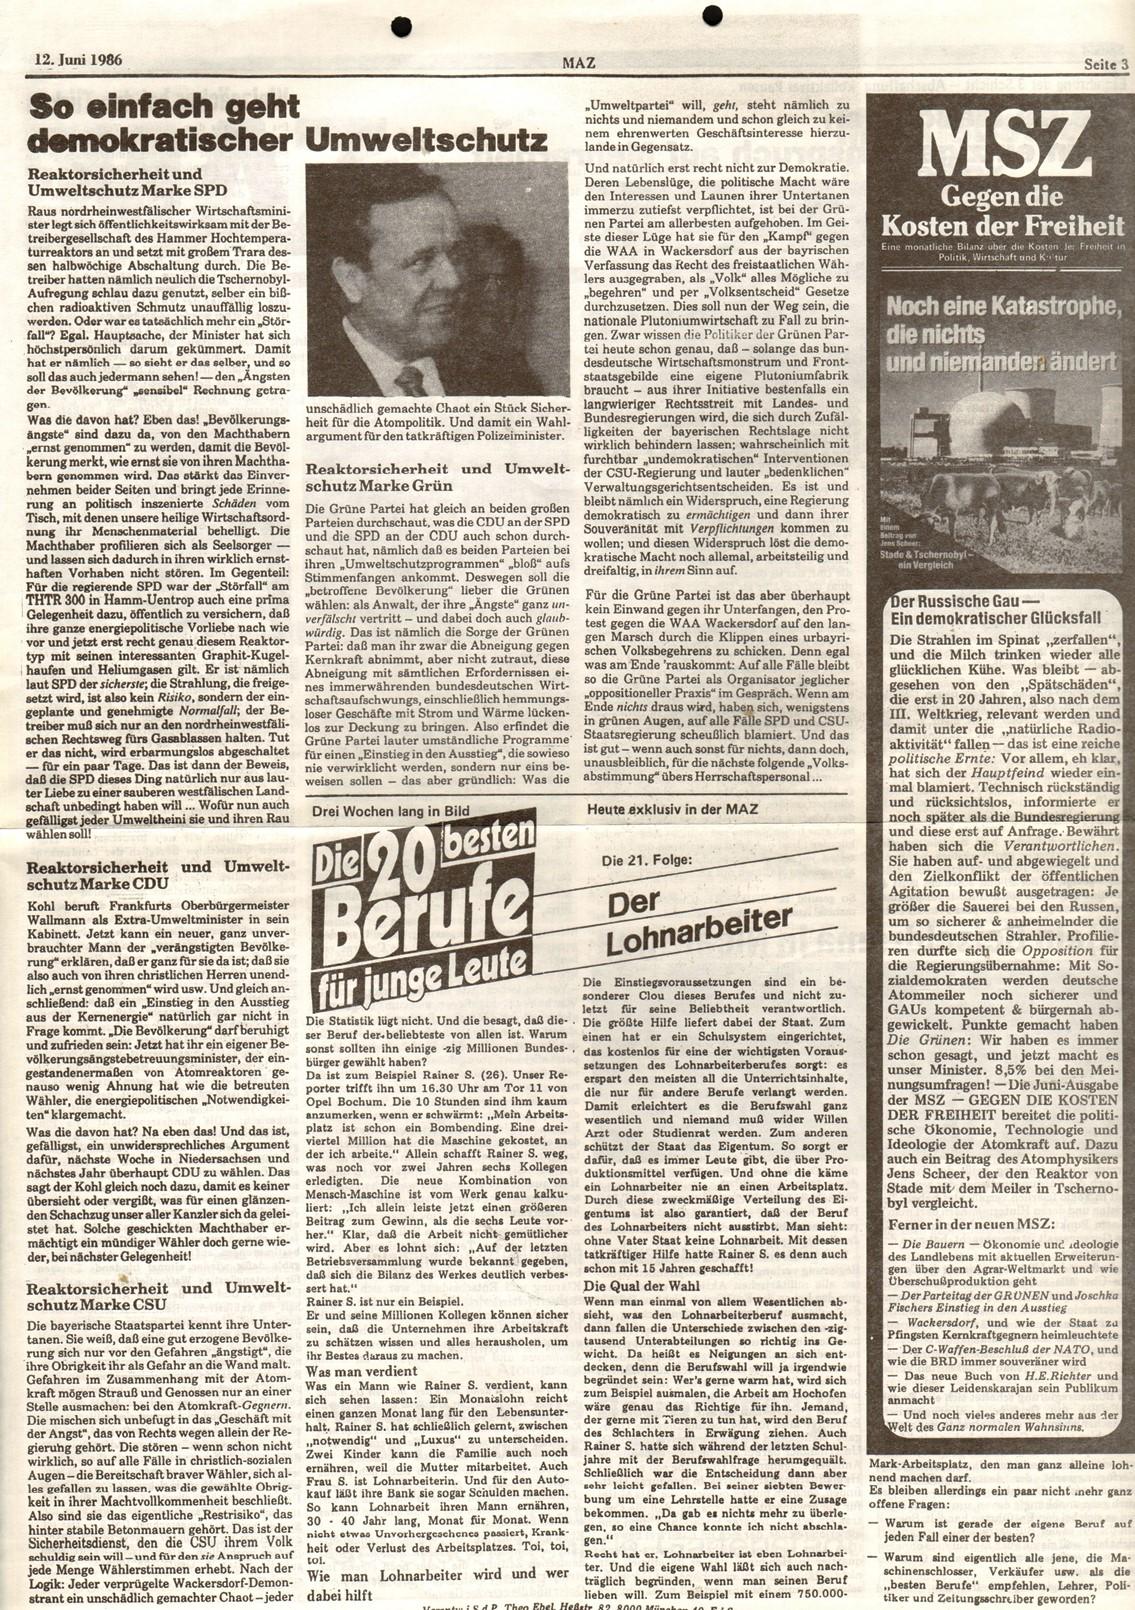 Erlangen_MG_MAZ_F_H_19860612_03